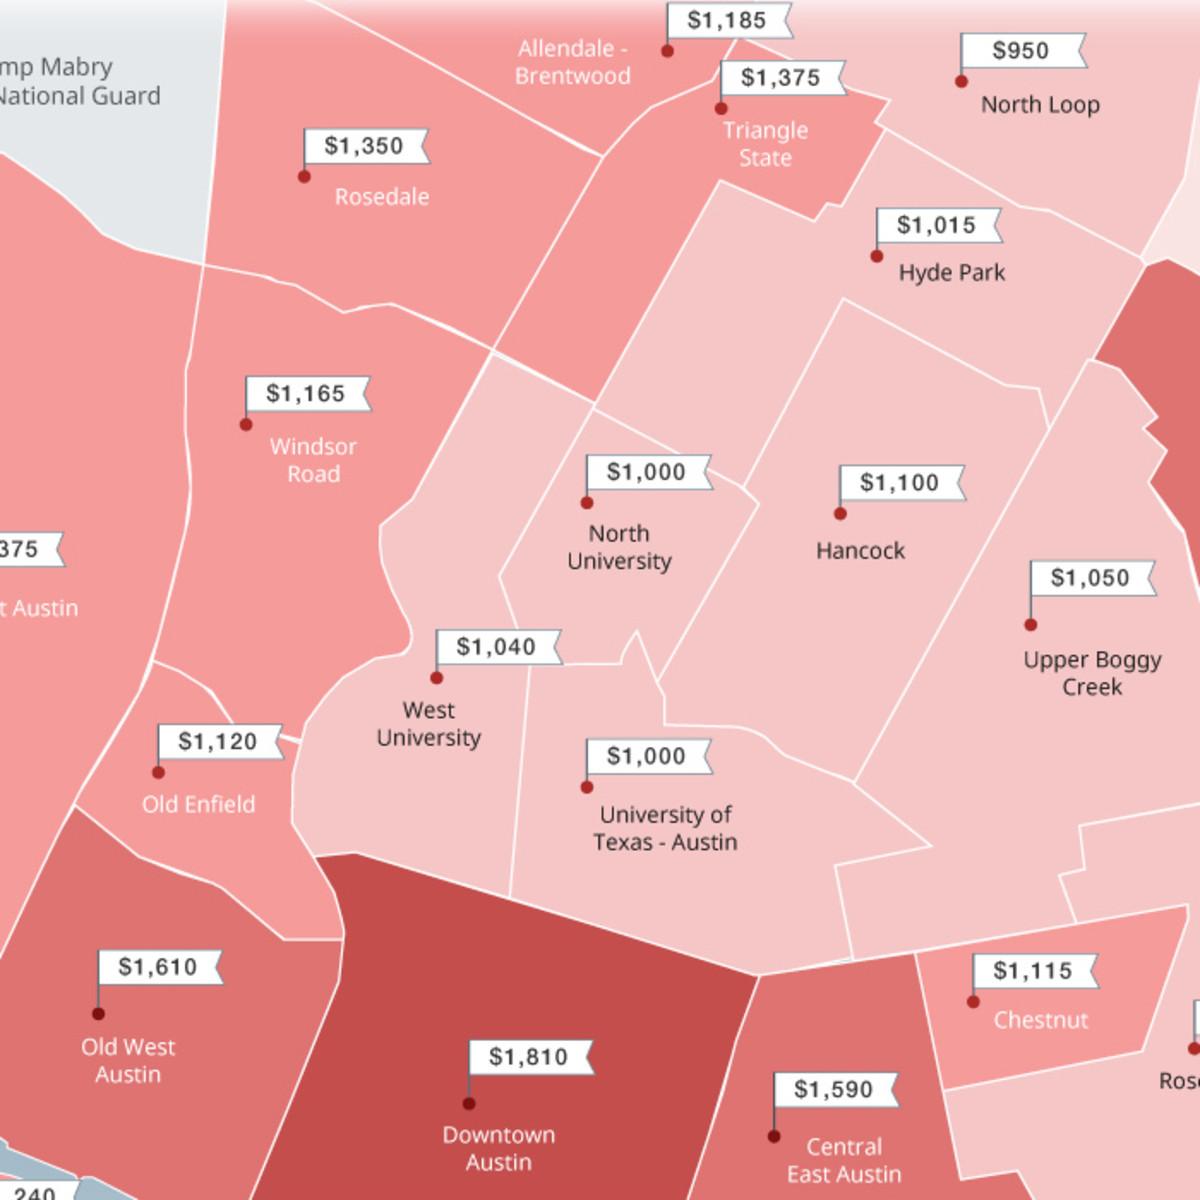 Austin rent price map Zumper.com